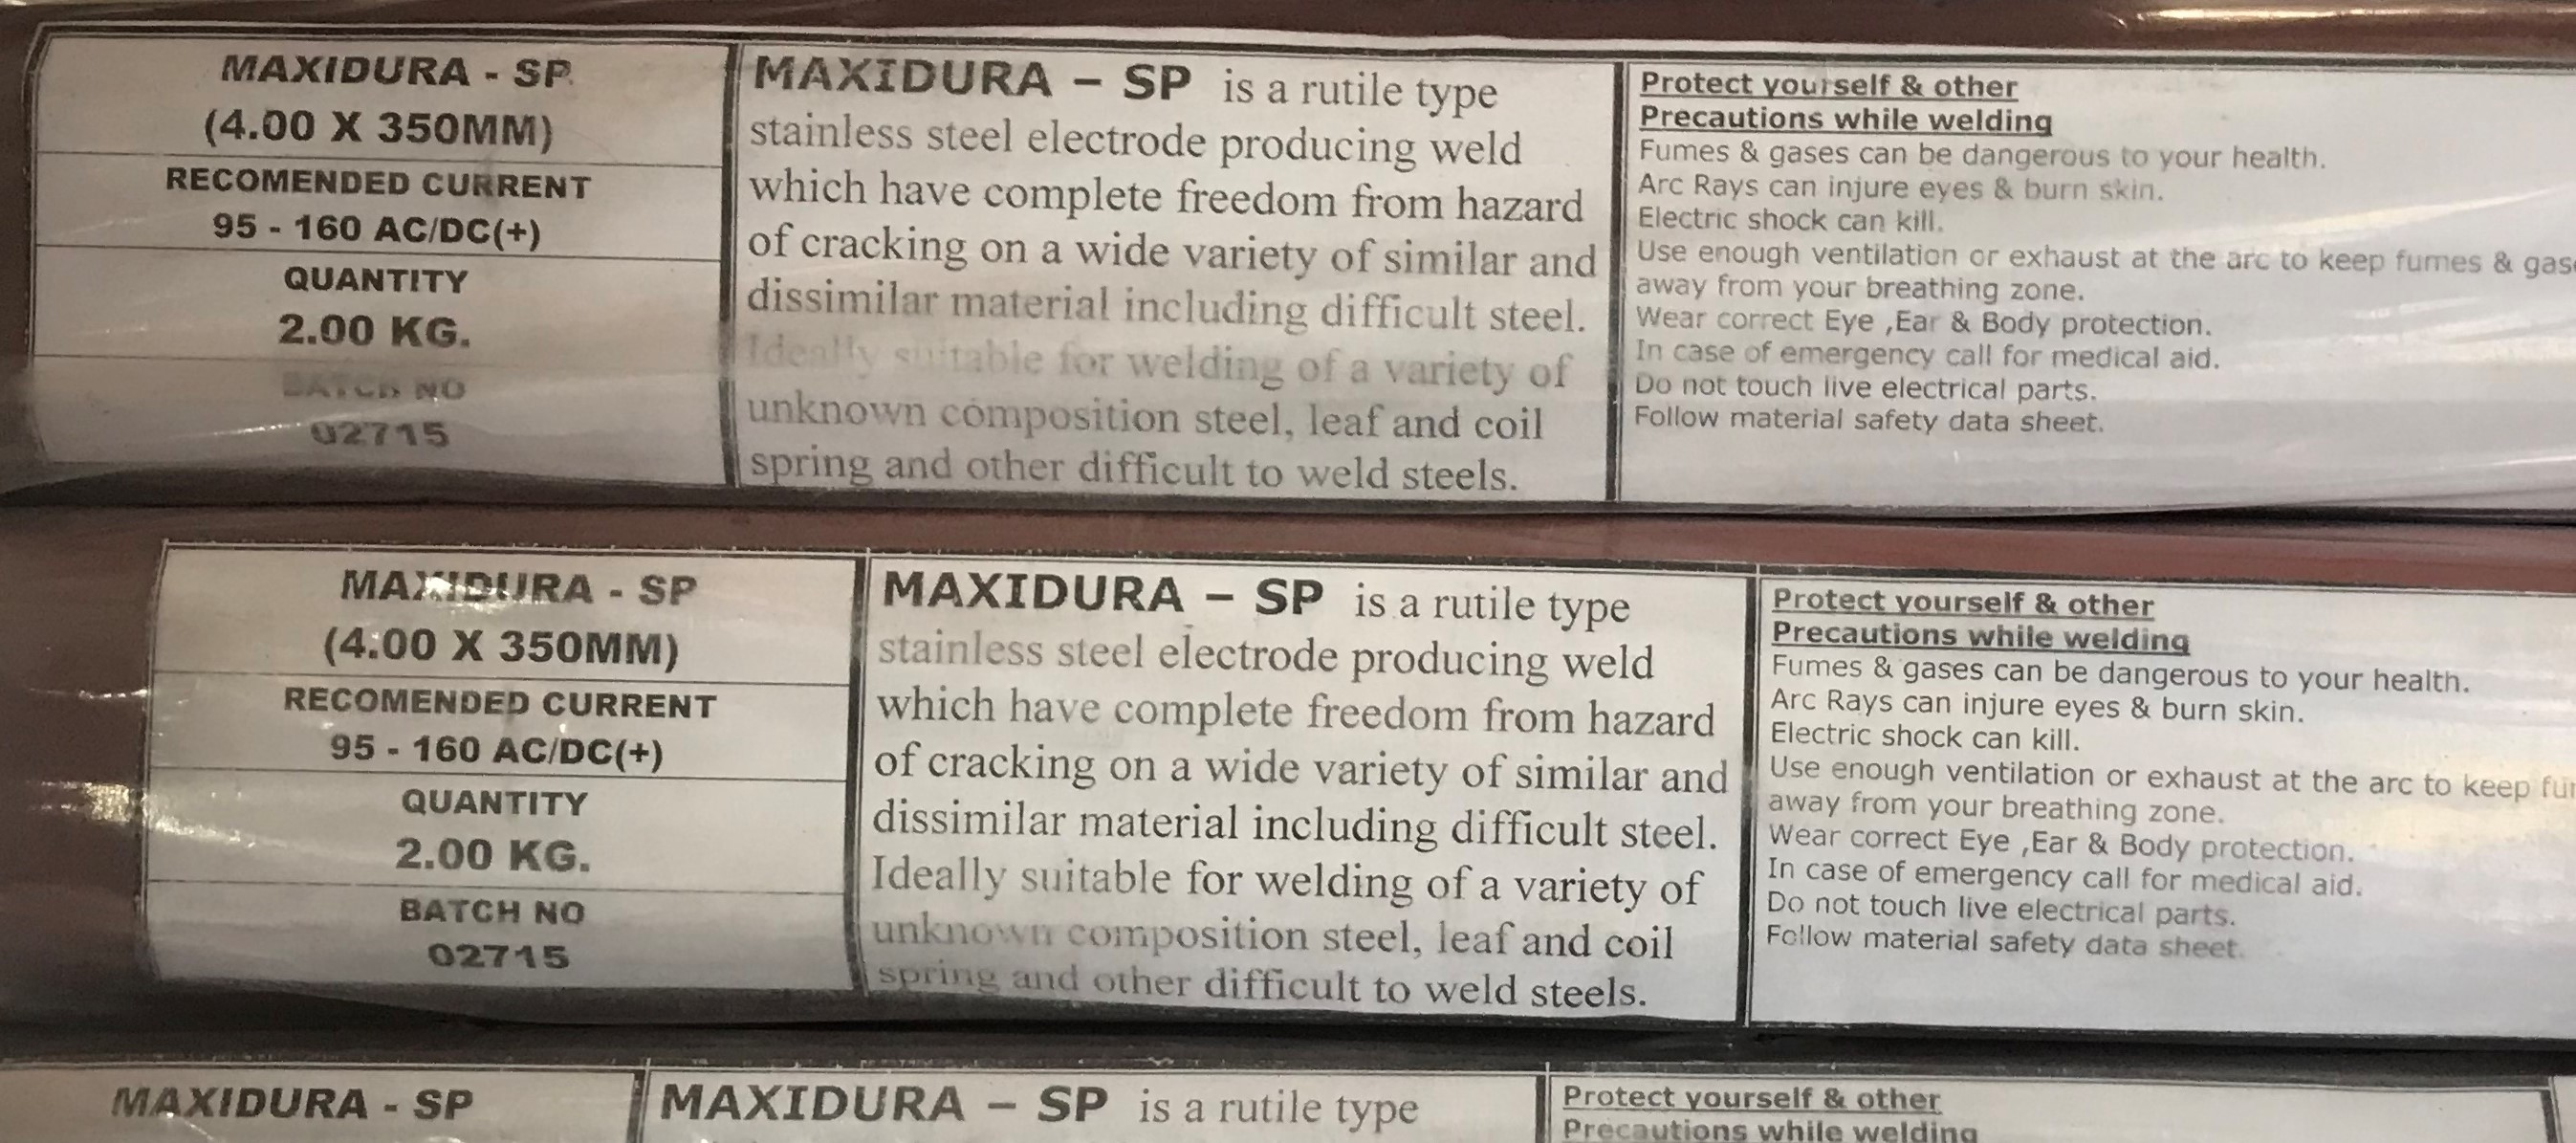 DISSIMILAR & UNKNOWN STEEL JOINING MAXIDURA - SP